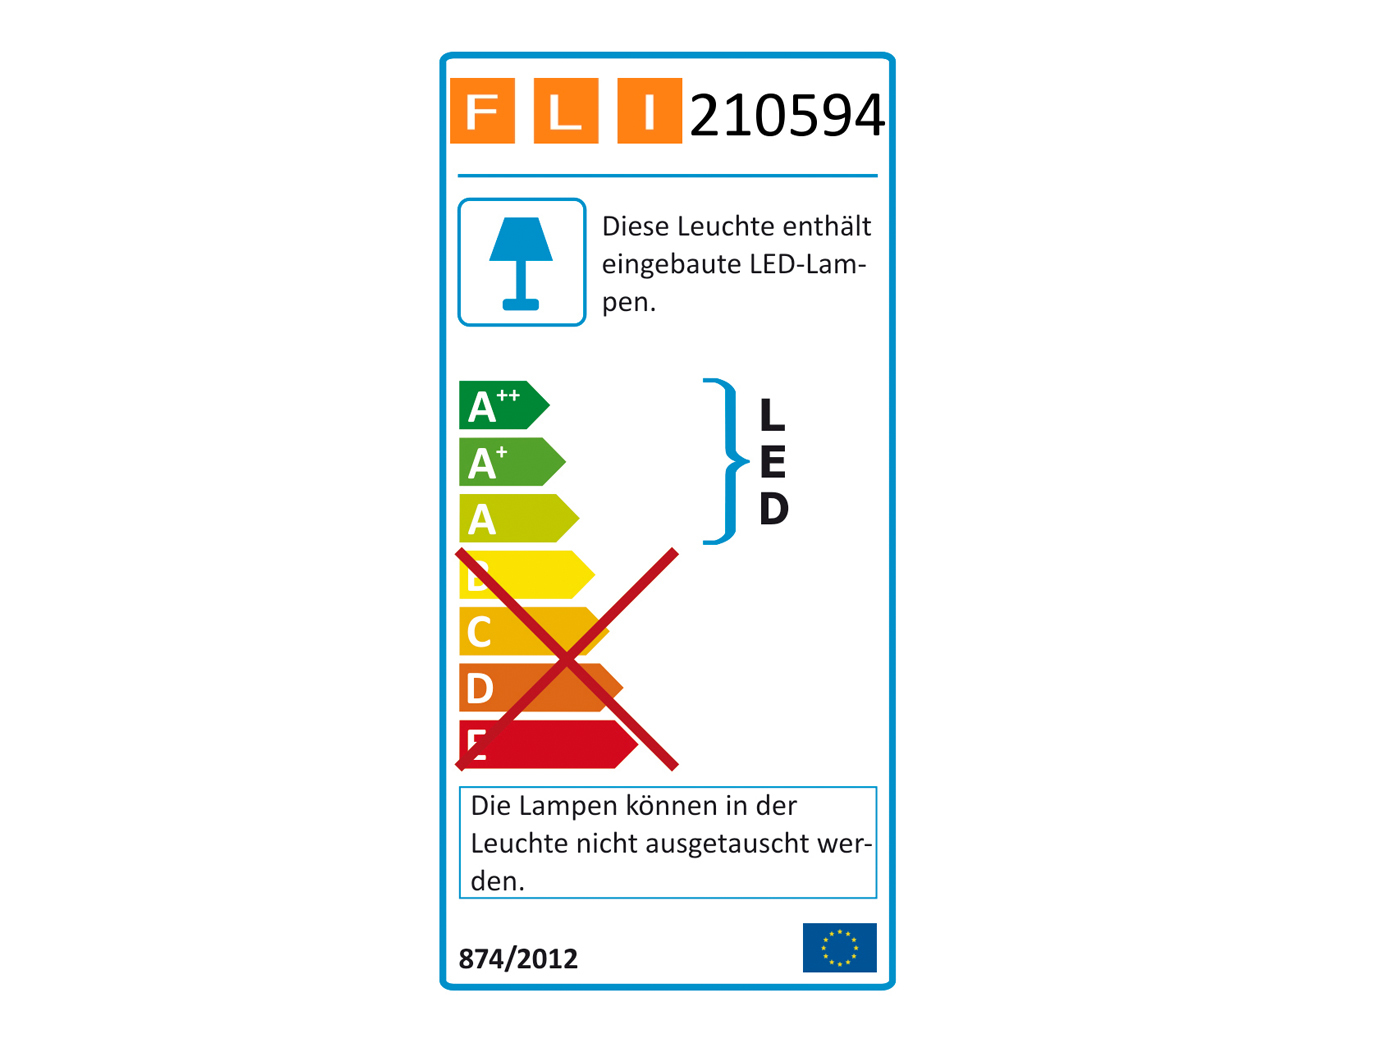 Ajustable dimmbare en altura dimmbare Ajustable colgante 4-fl. níquel mate fli-luminarias 6e8bd6